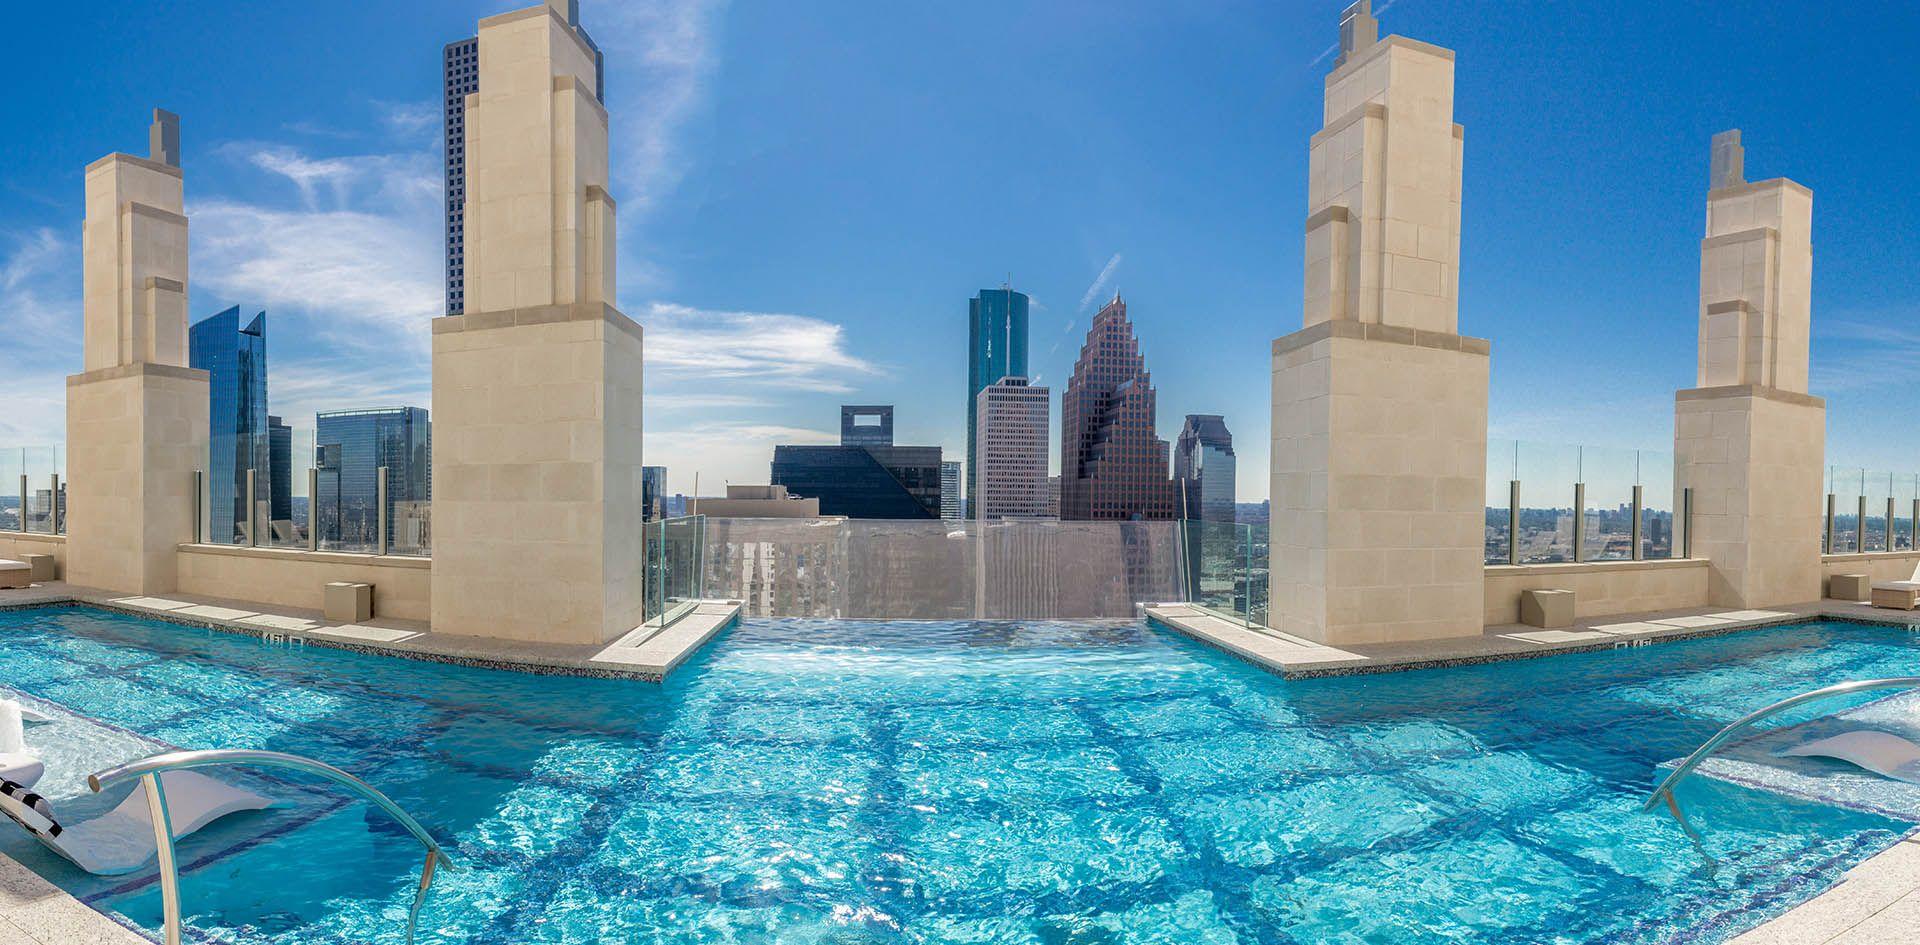 Market Square Tower Jackson Ryan Architects Pool Glass